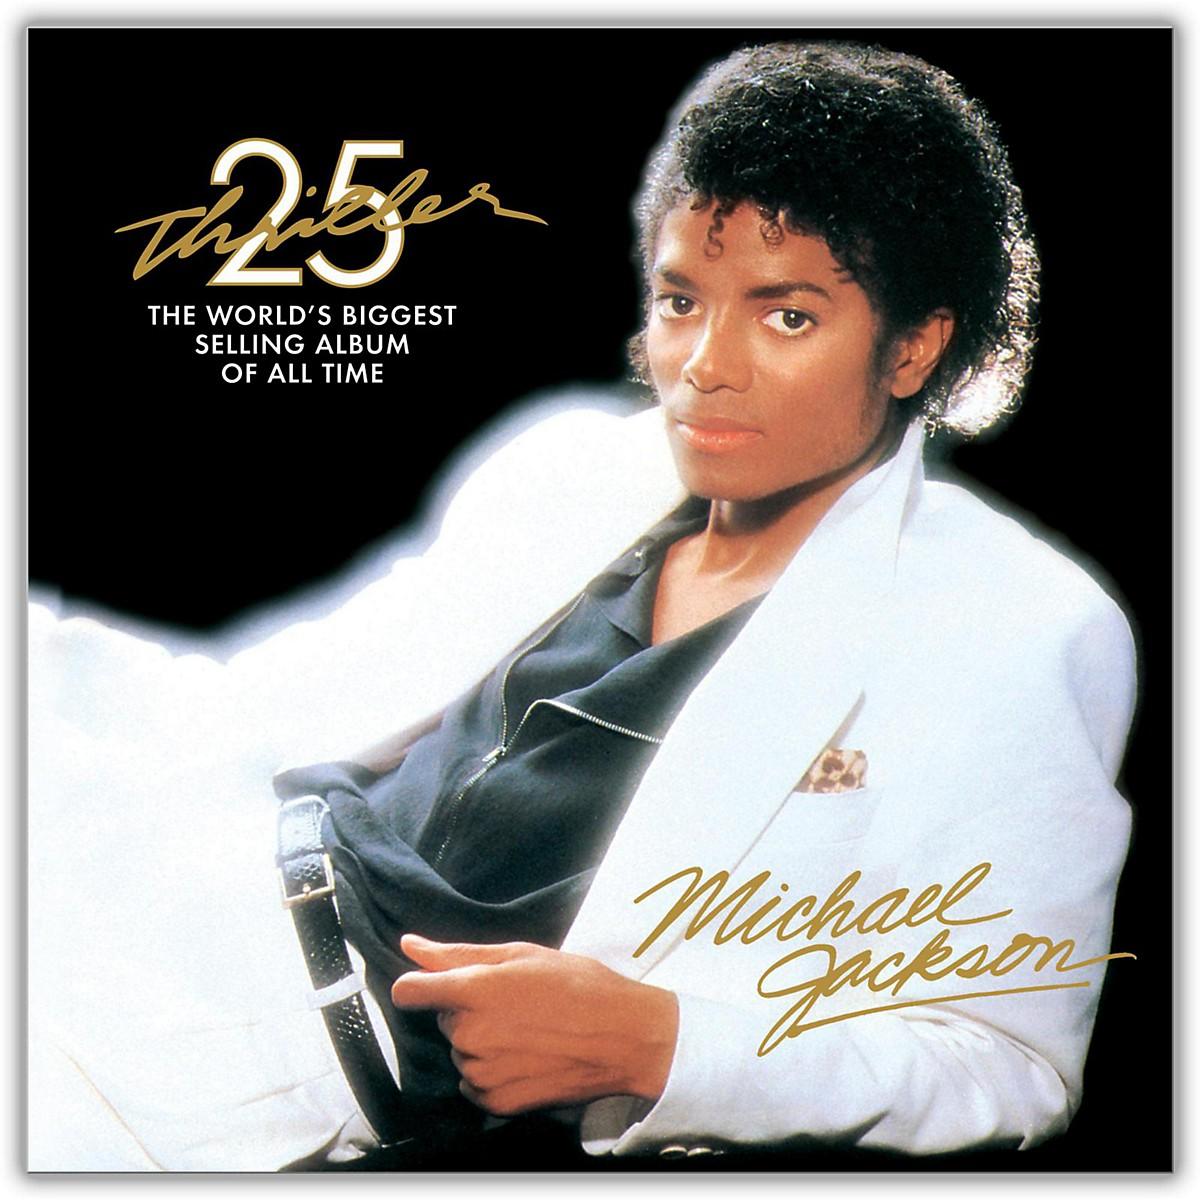 Sony Michael Jackson - Thriller (25th Anniversary Edition) Vinyl LP